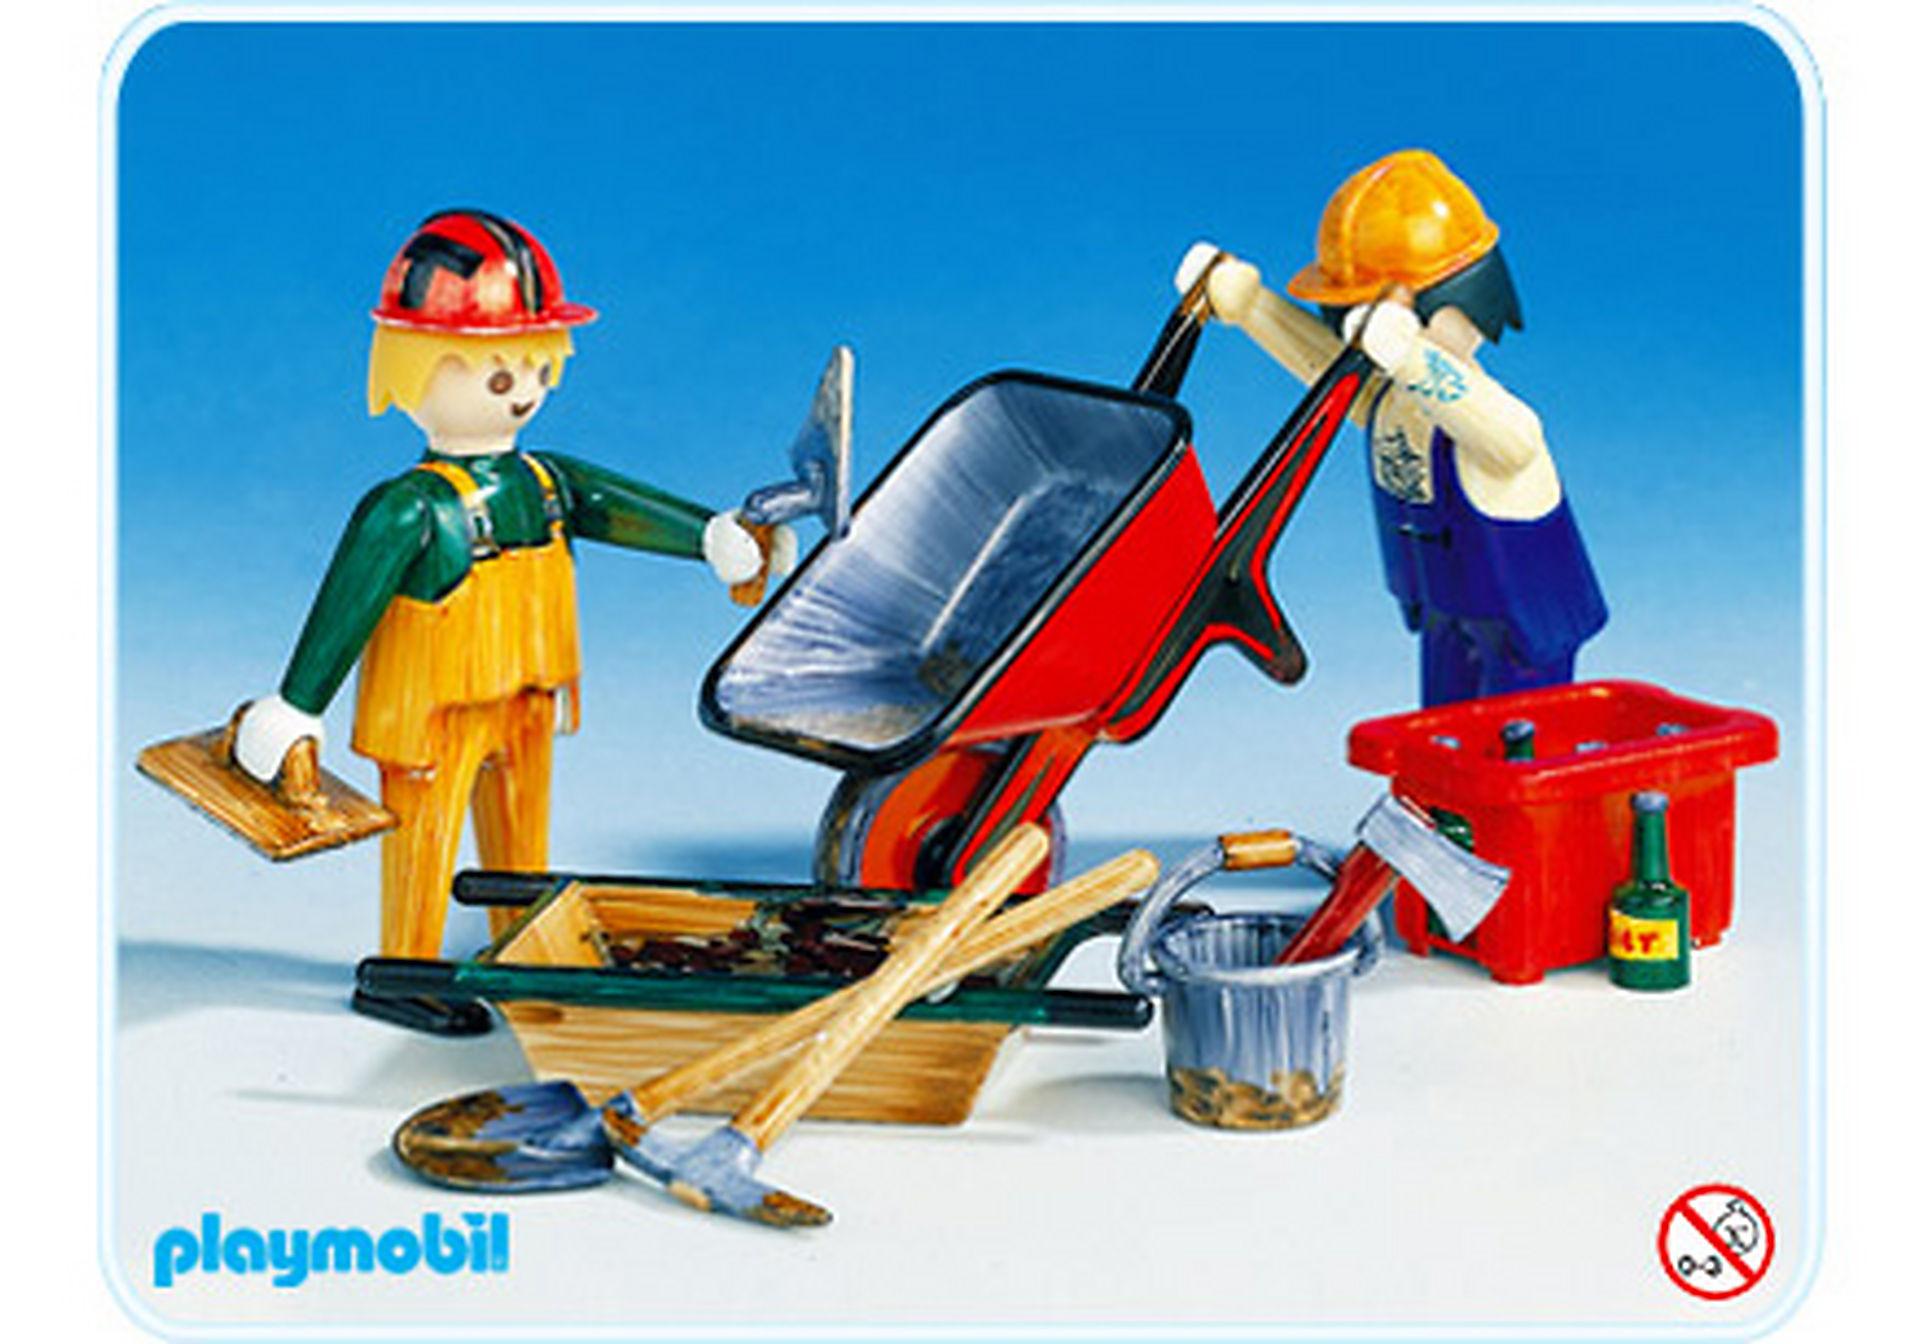 http://media.playmobil.com/i/playmobil/3690-A_product_detail/2 Bauarbeiter mit Schubkarren